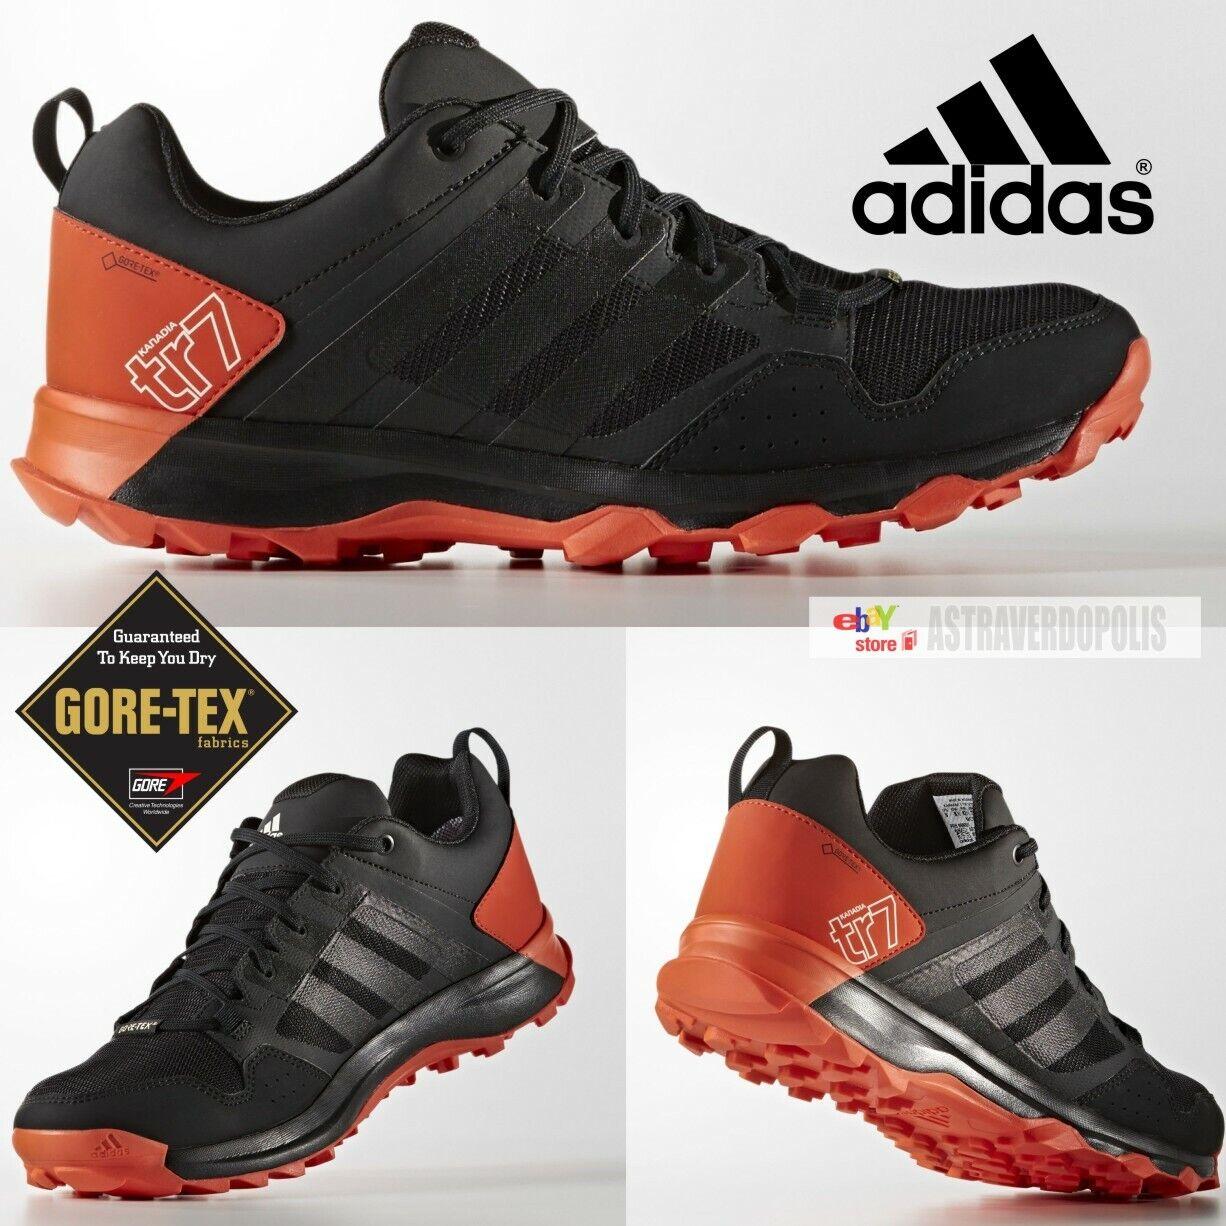 ADIDAS GORE TEX  KANADIA 7 TR TRAIL MENS scarpe SKYCHASER ENERGY BOOST GTX BB5428  alta qualità generale